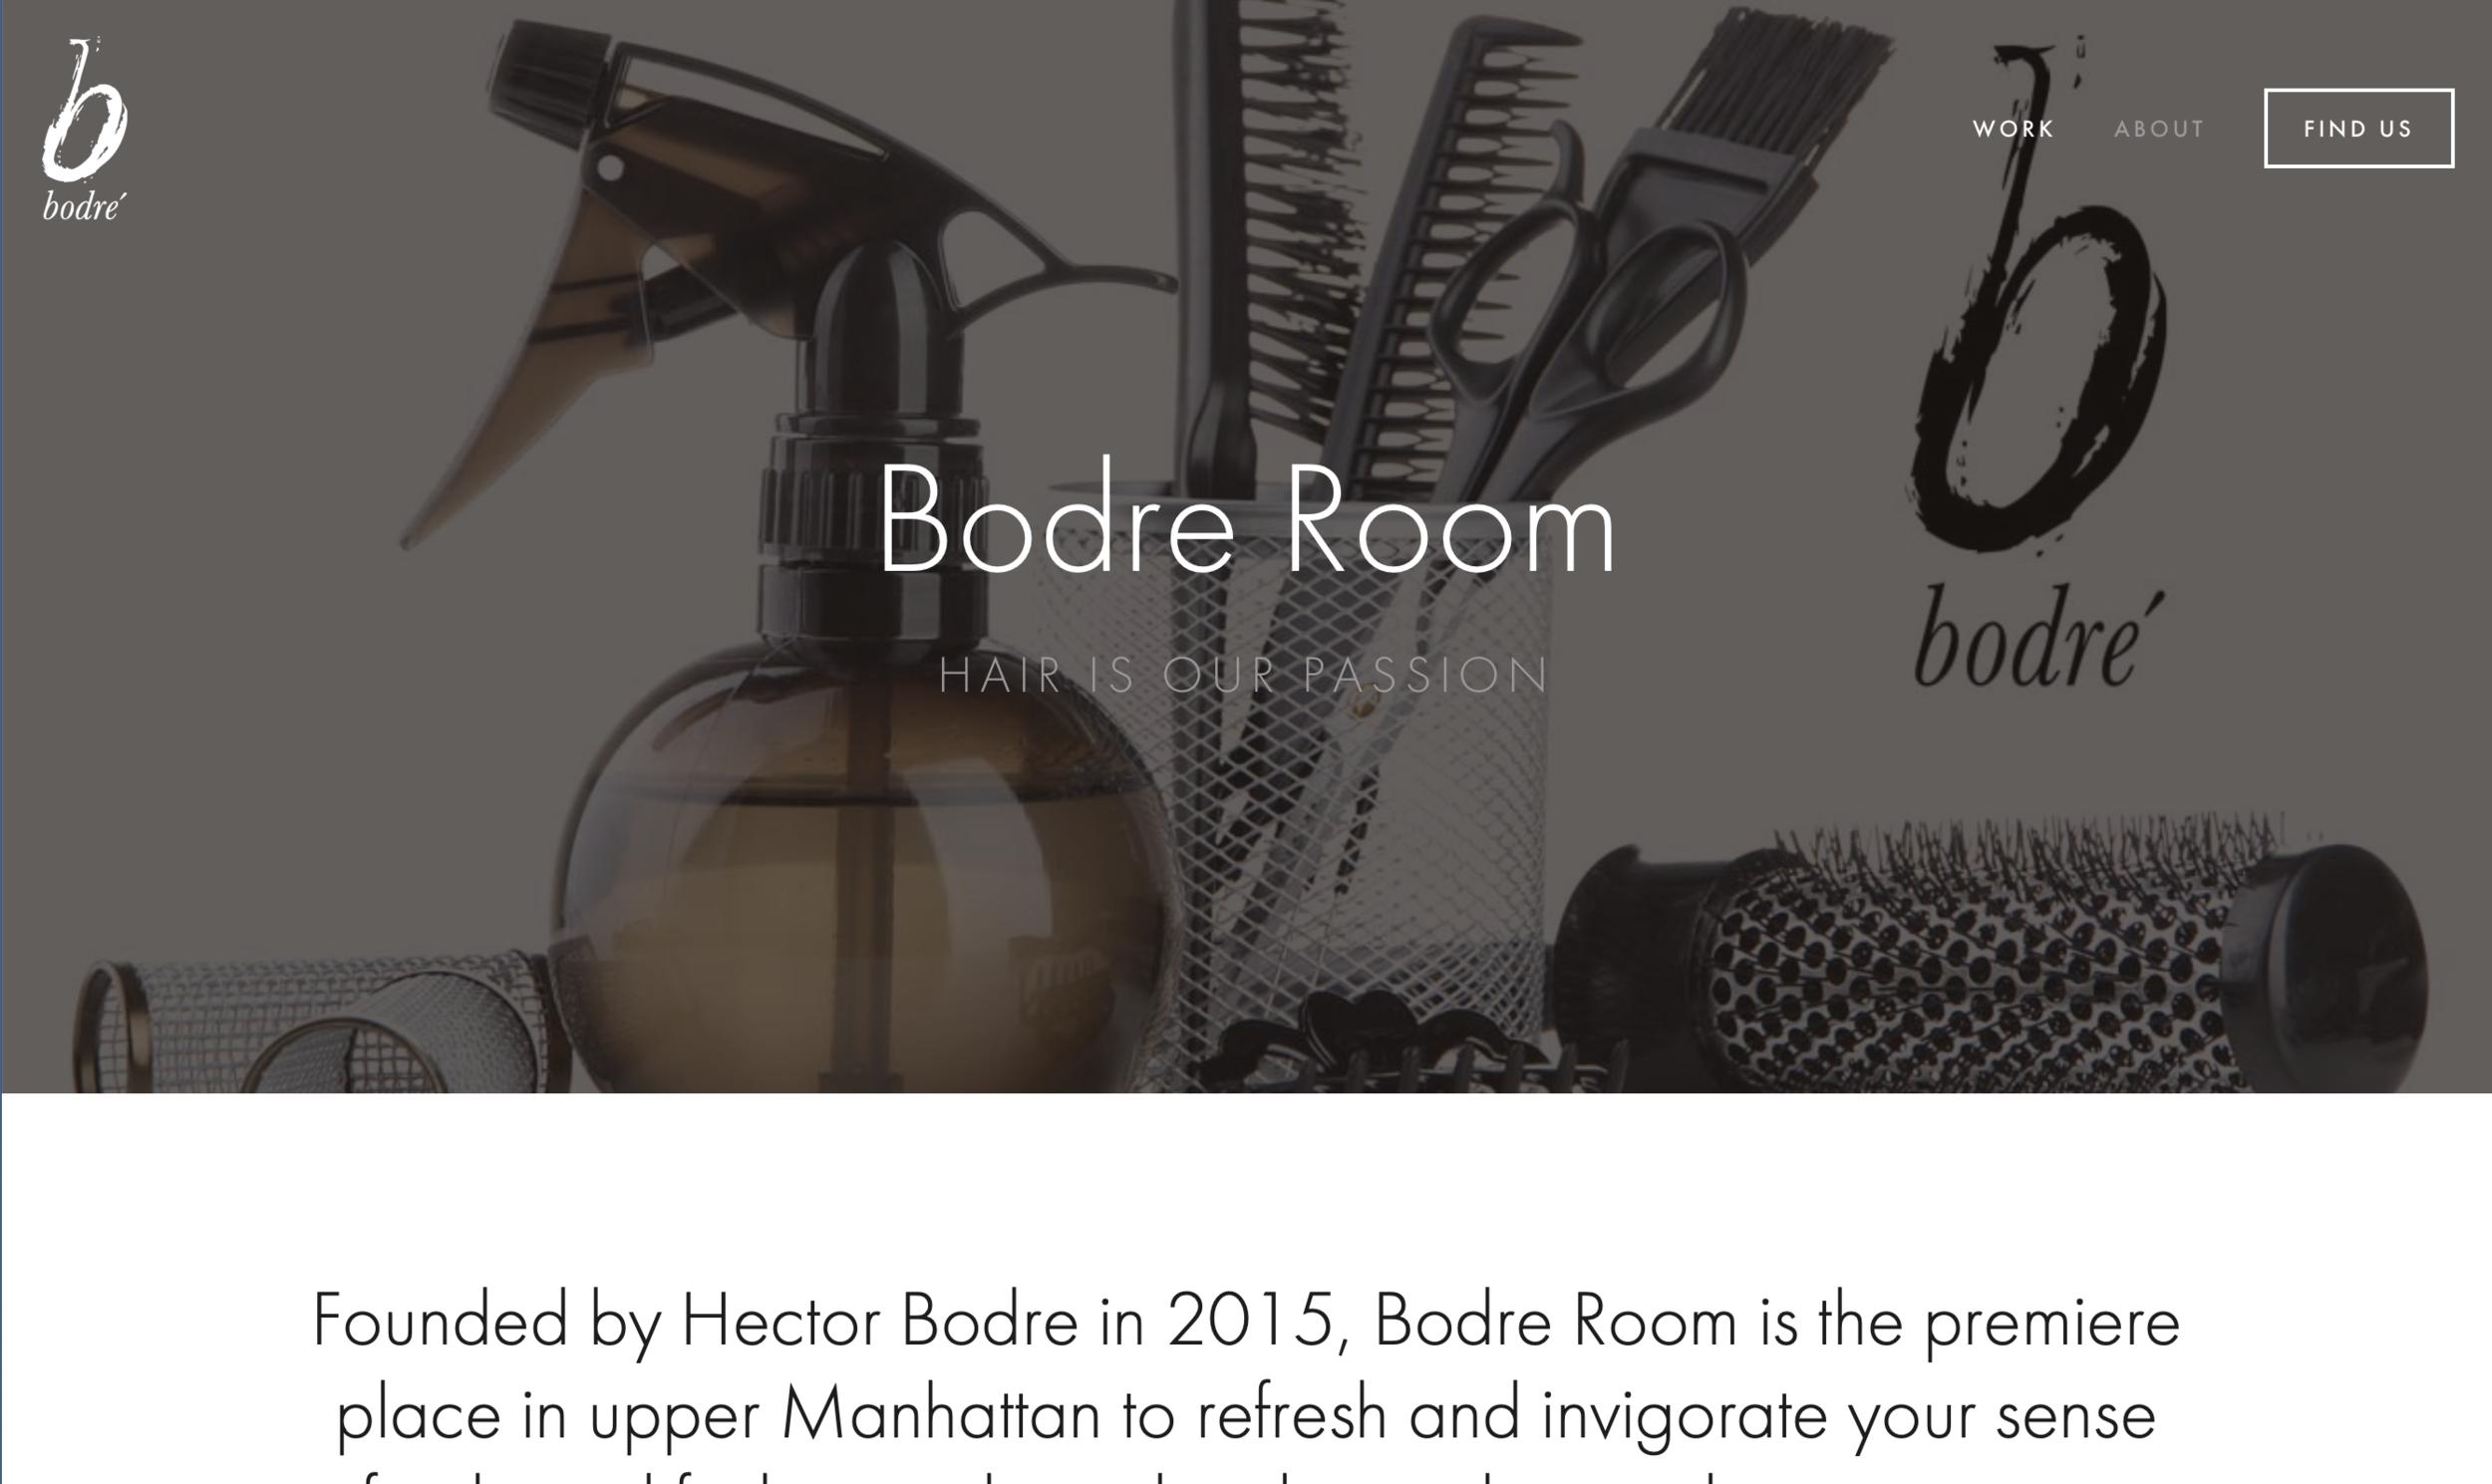 Bodre Room: Hair Salon